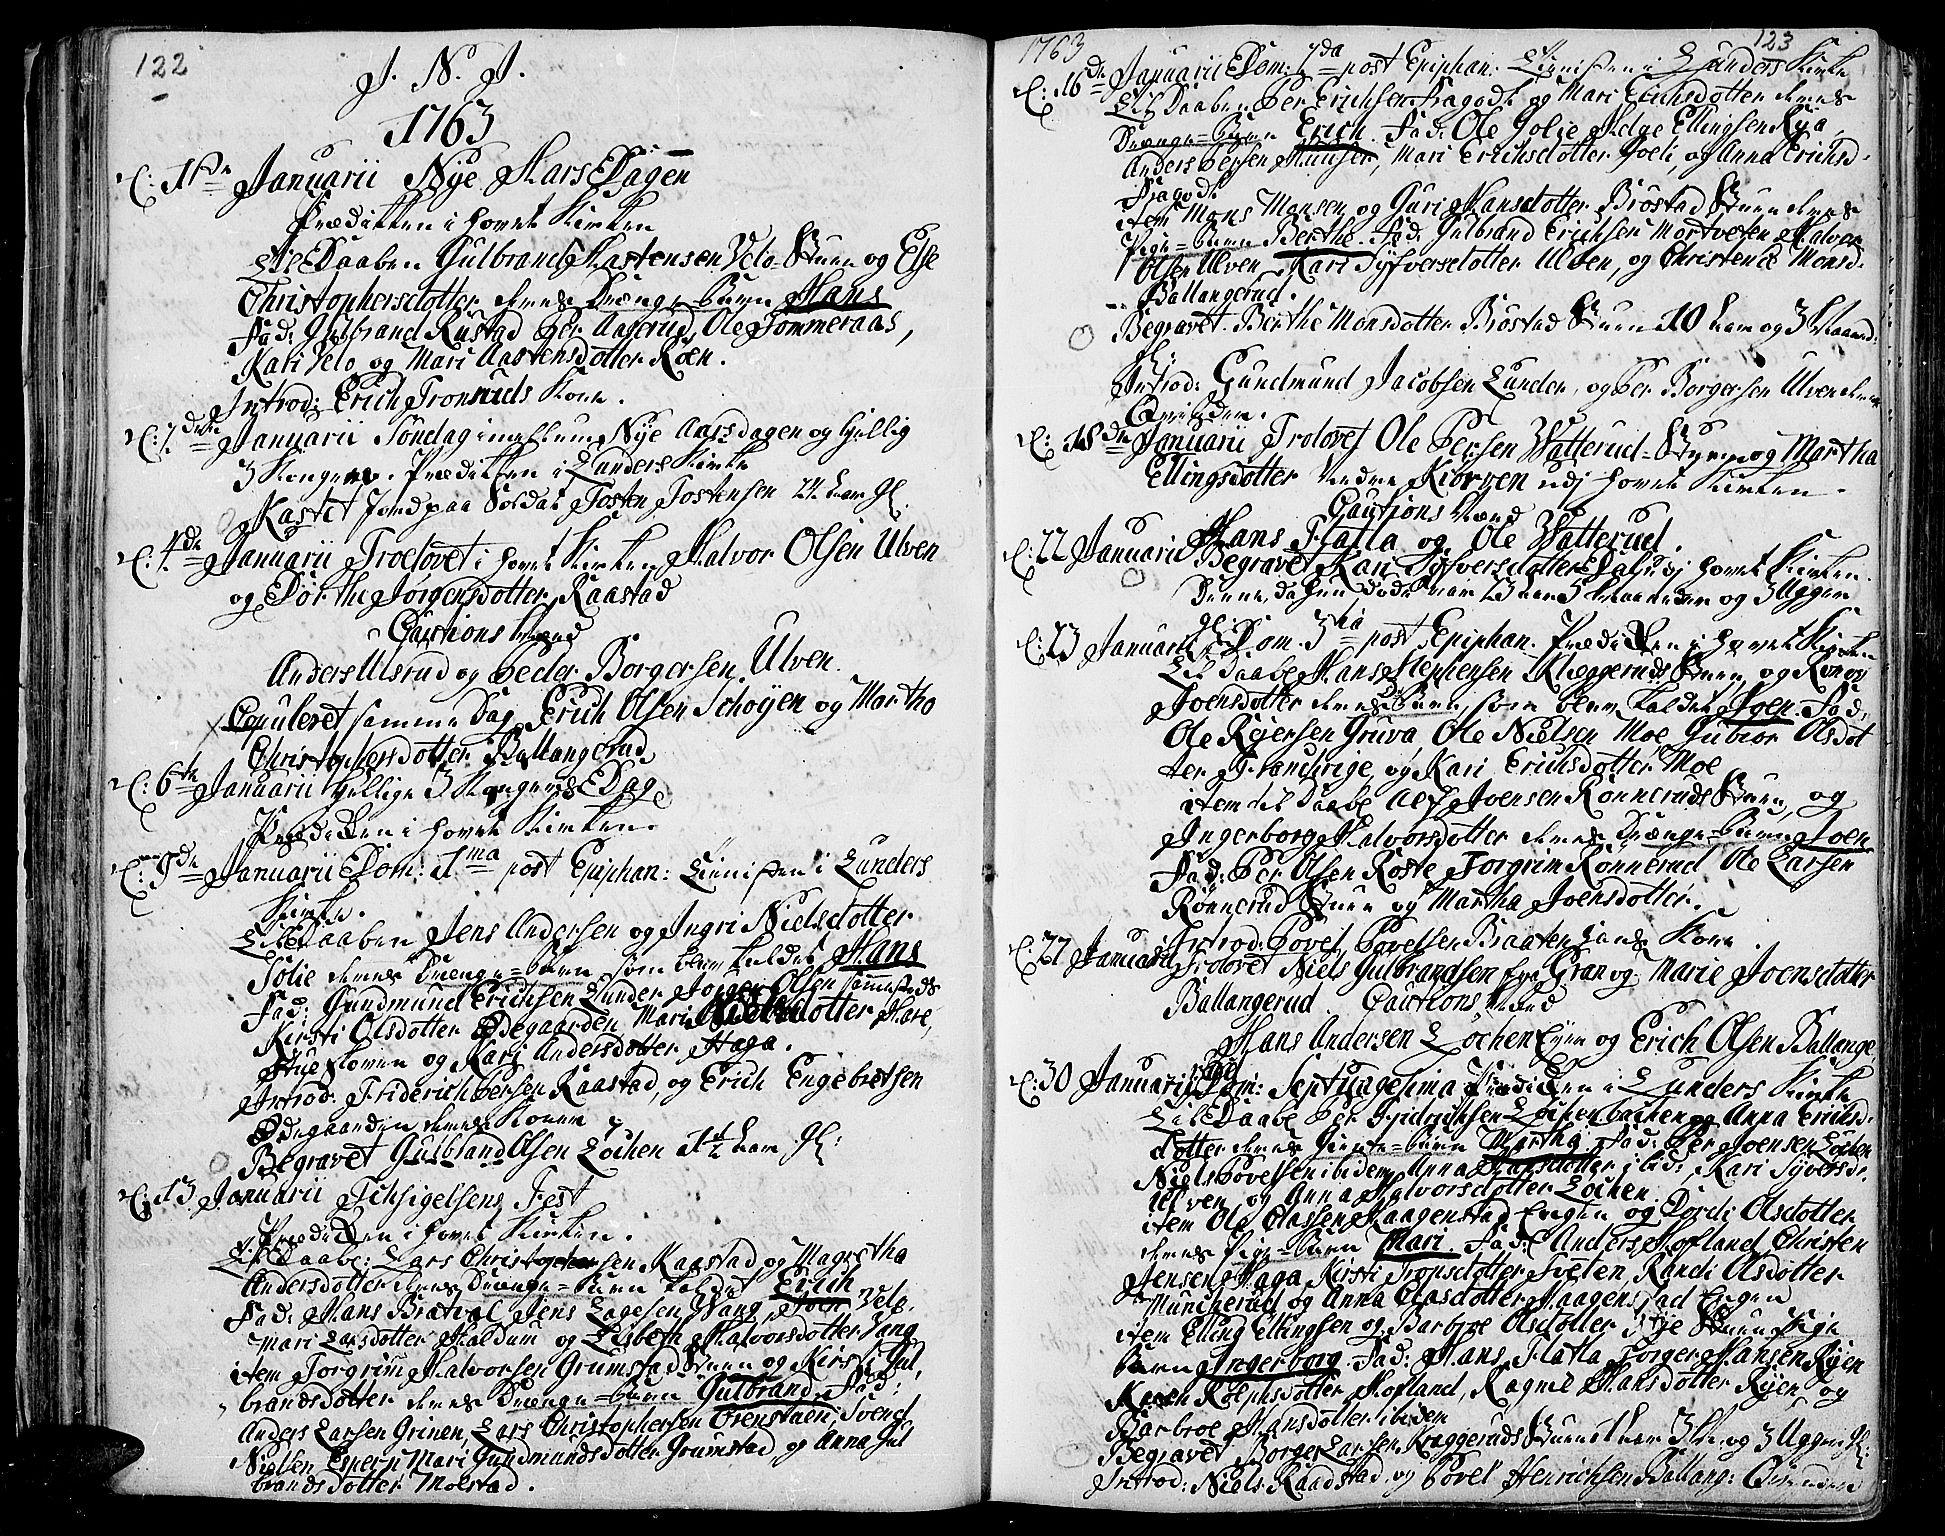 SAH, Jevnaker prestekontor, Ministerialbok nr. 3, 1752-1799, s. 122-123